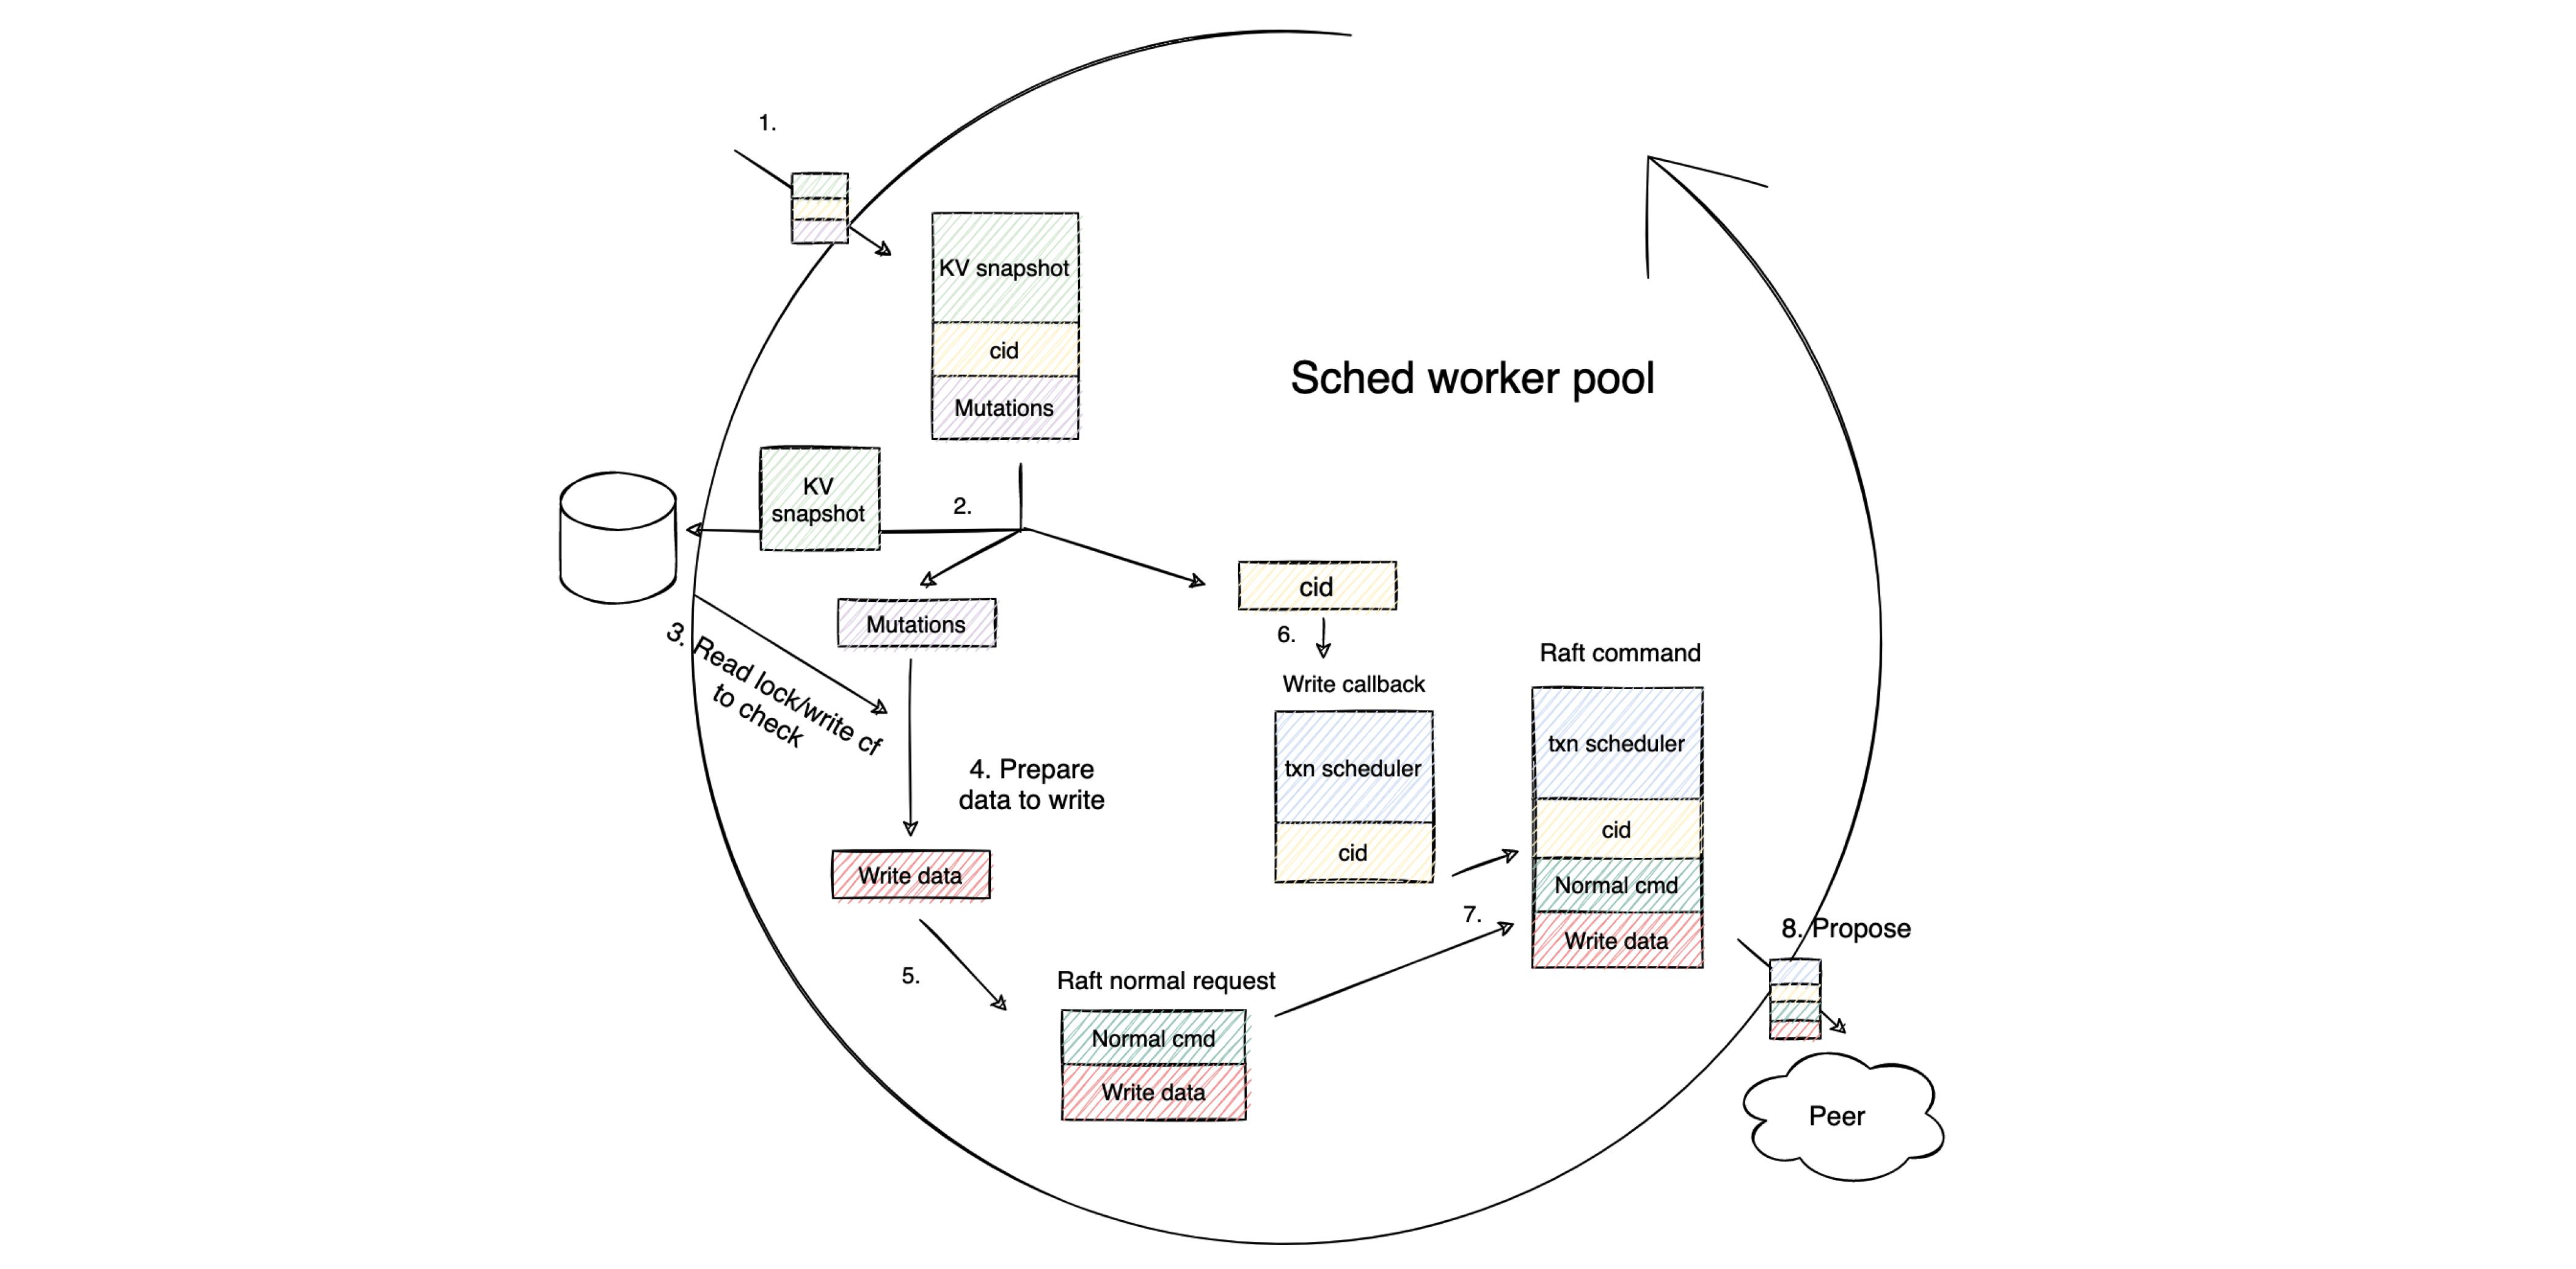 Write Prepare phase workflow